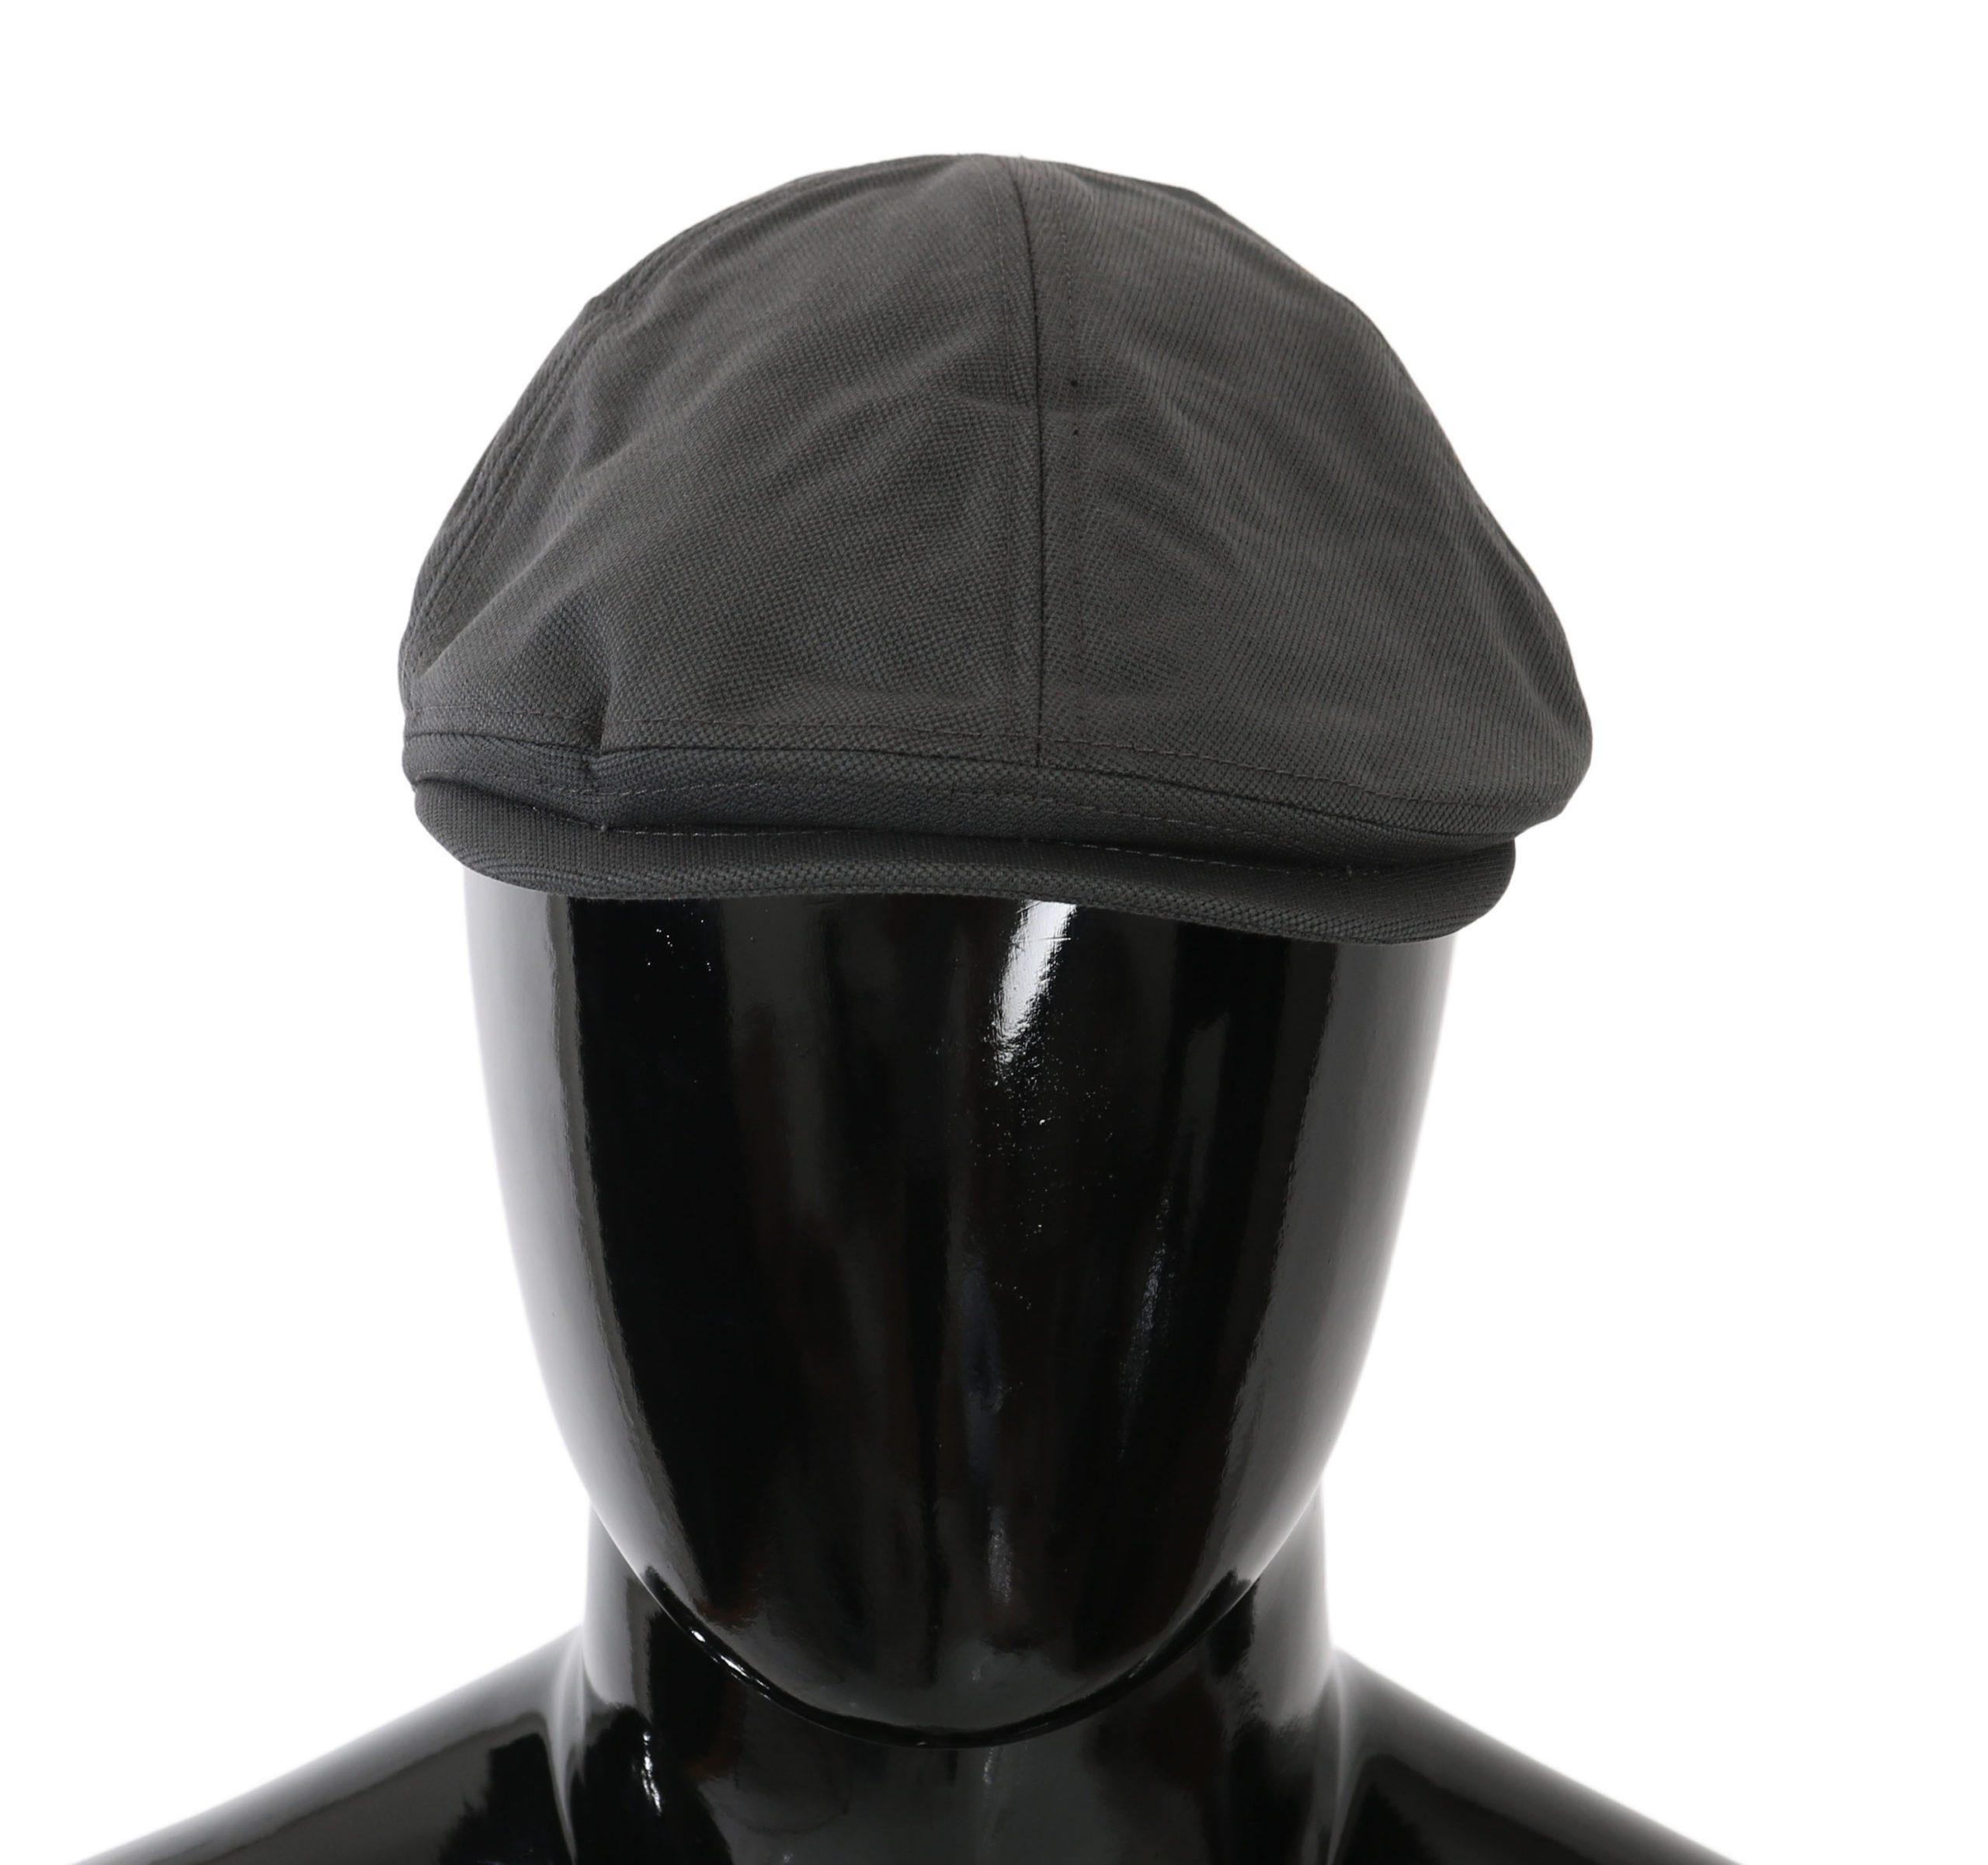 Dolce & Gabbana Men's Nylon Logo Newsboy Capello Hat Gray HAT81027 - 58 cm M